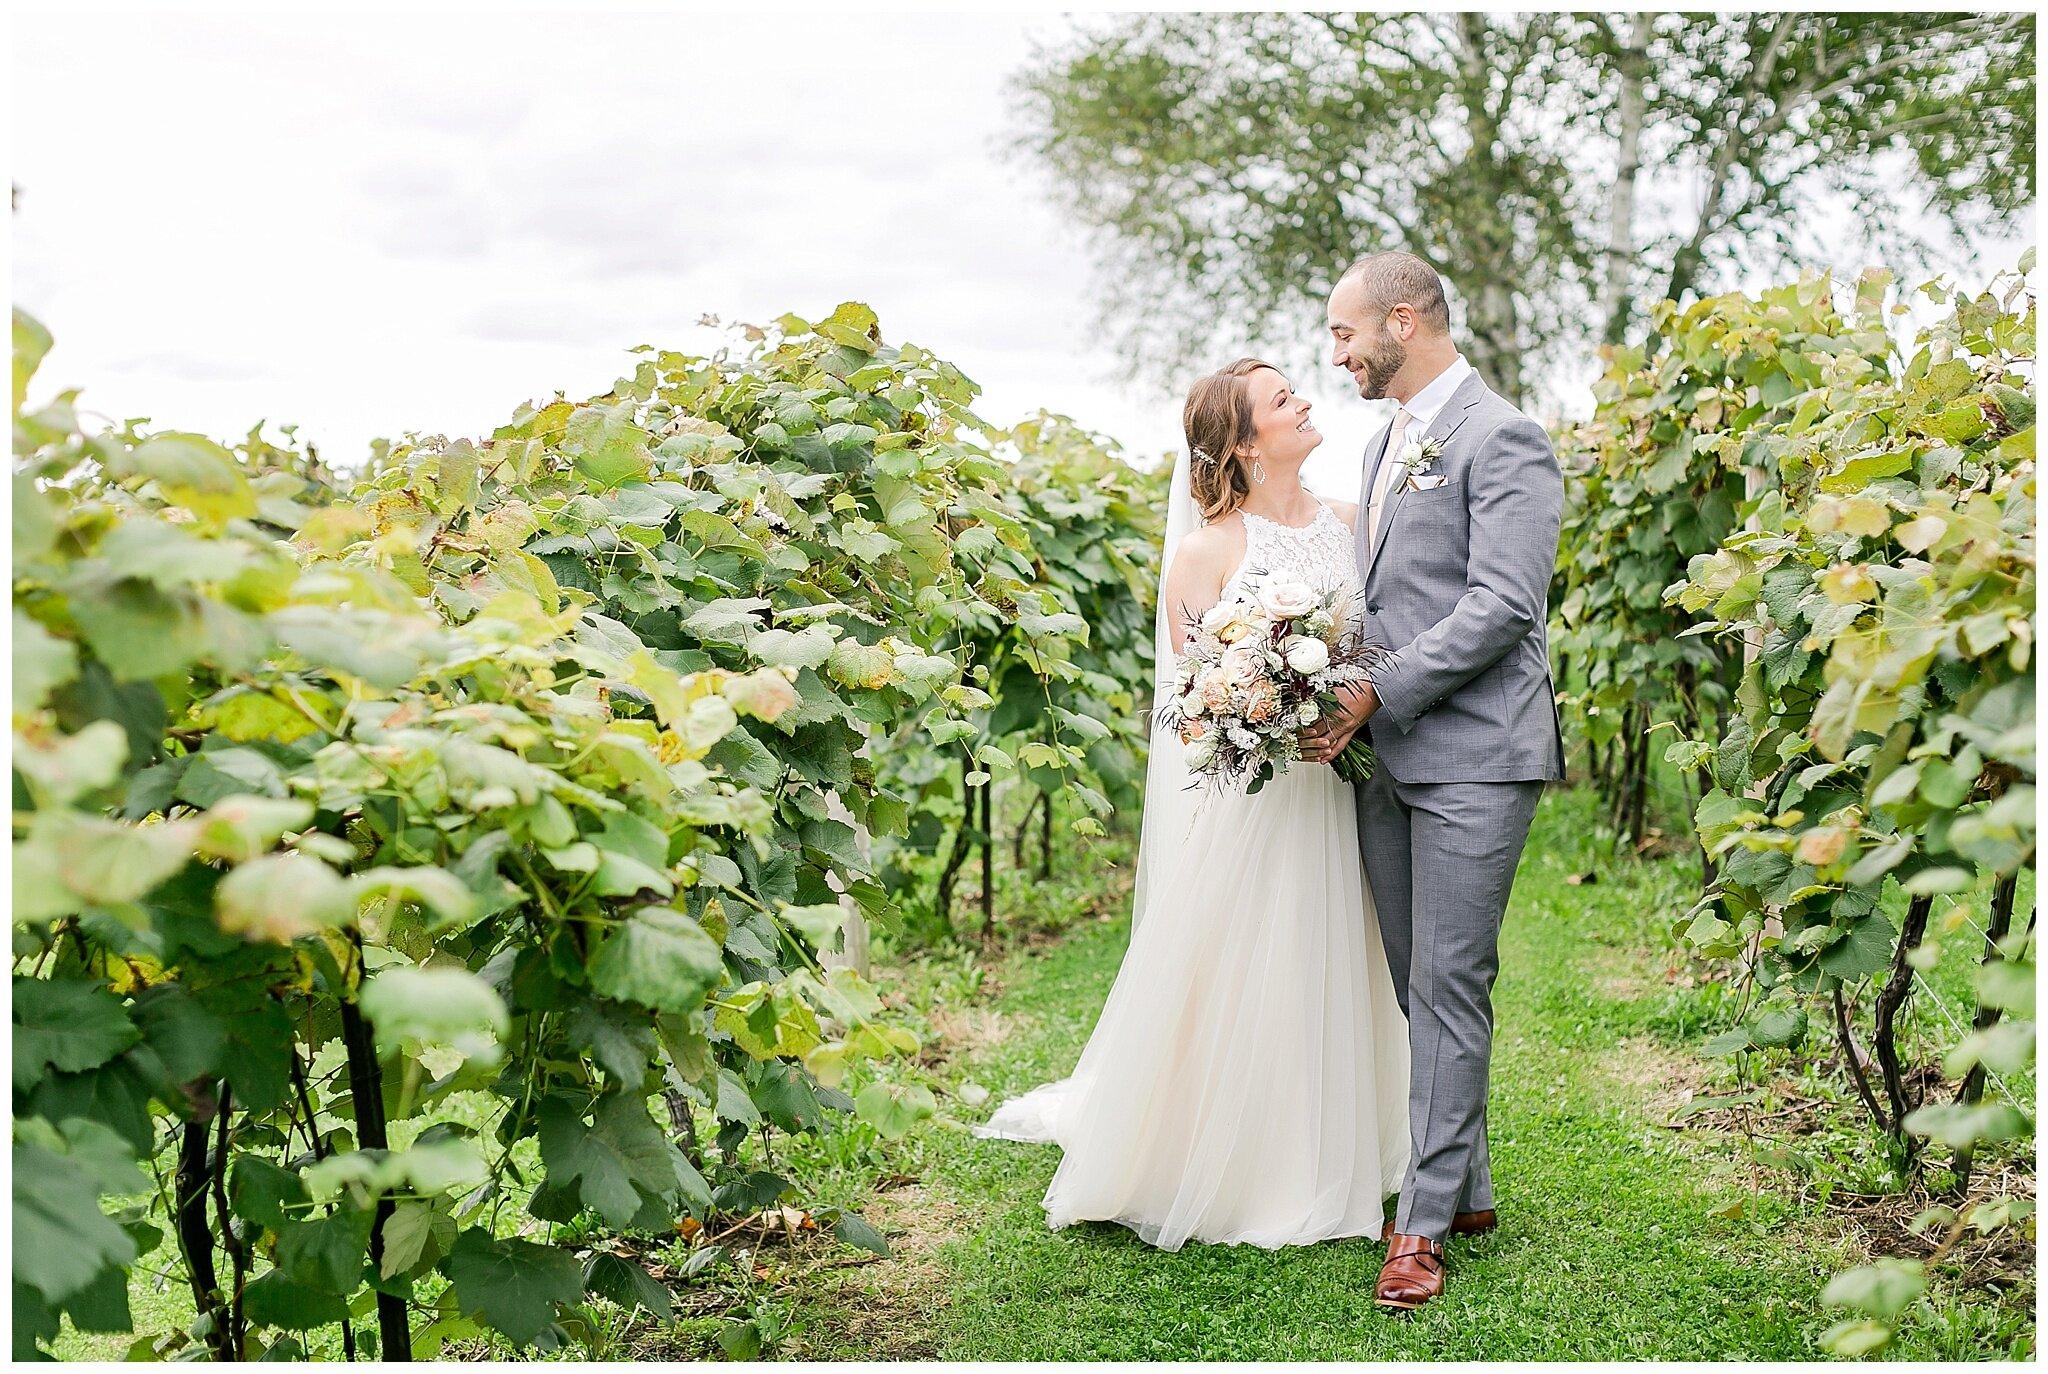 over_the_vines_edgerton_wisconsin_wedding_madison_wisconsin_photographer_0435.jpg